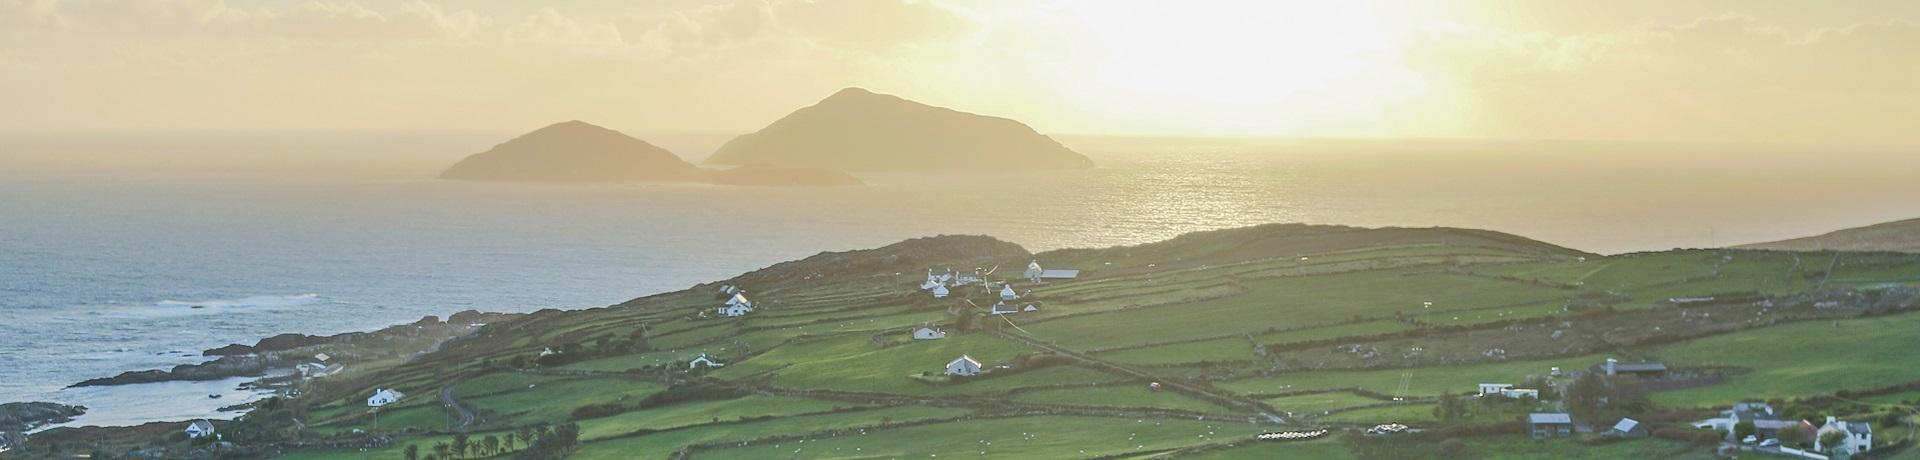 Irland - Kerry - Emotion